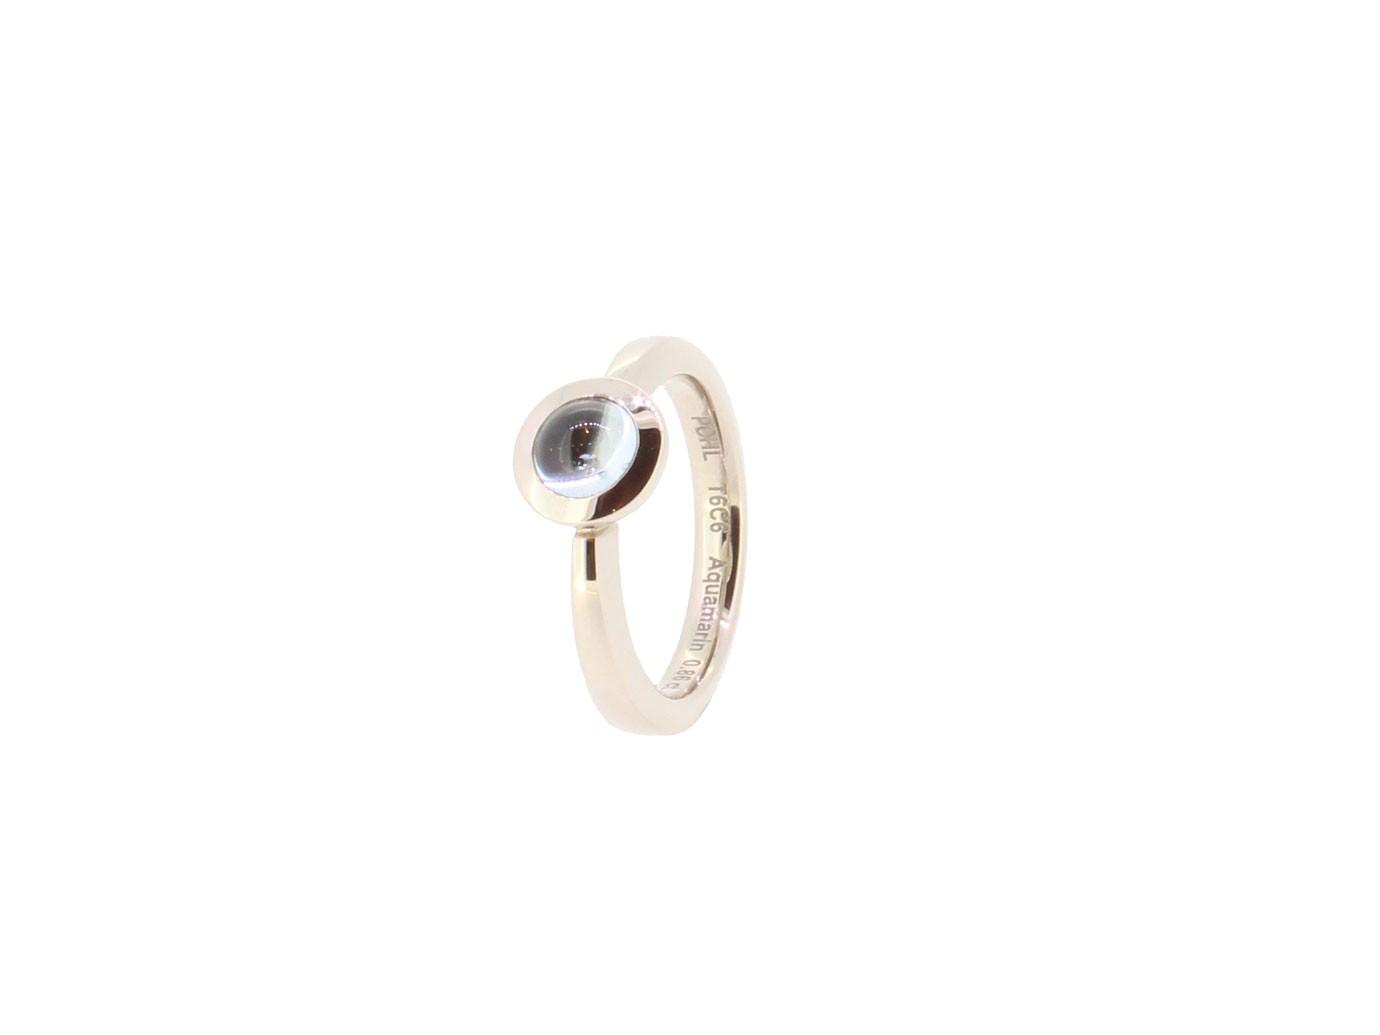 Ring Type Aquamarin 18ct Gold - Jochen Pohl - T6C6-Aqu